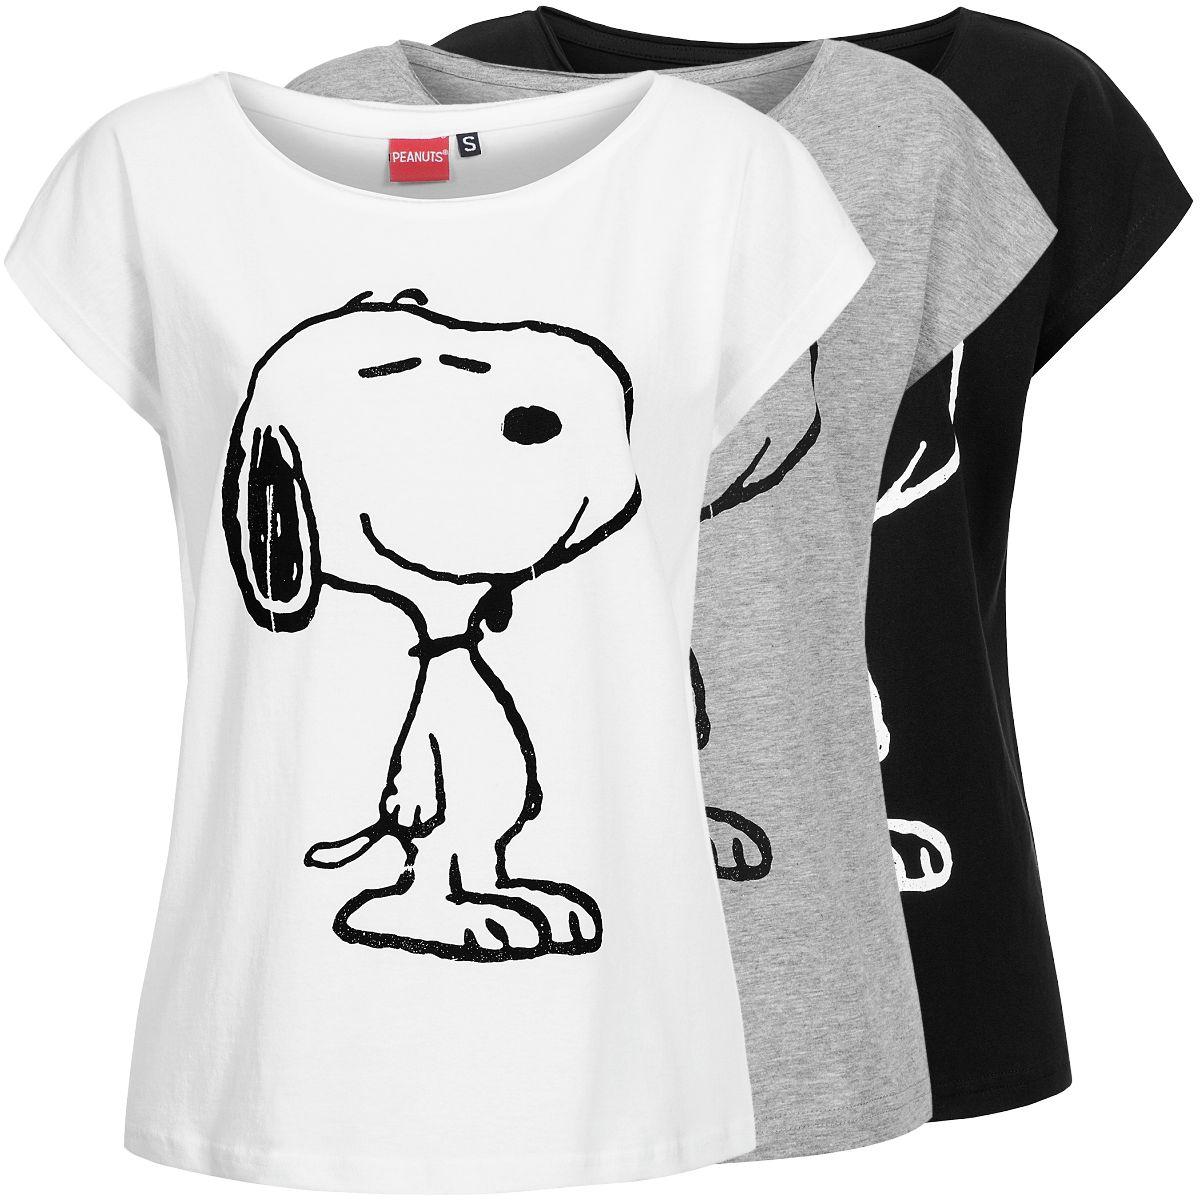 sublevel damen t shirt snoopy lsl 218 damenshirt shirt kurzarmshirt oversize ebay. Black Bedroom Furniture Sets. Home Design Ideas